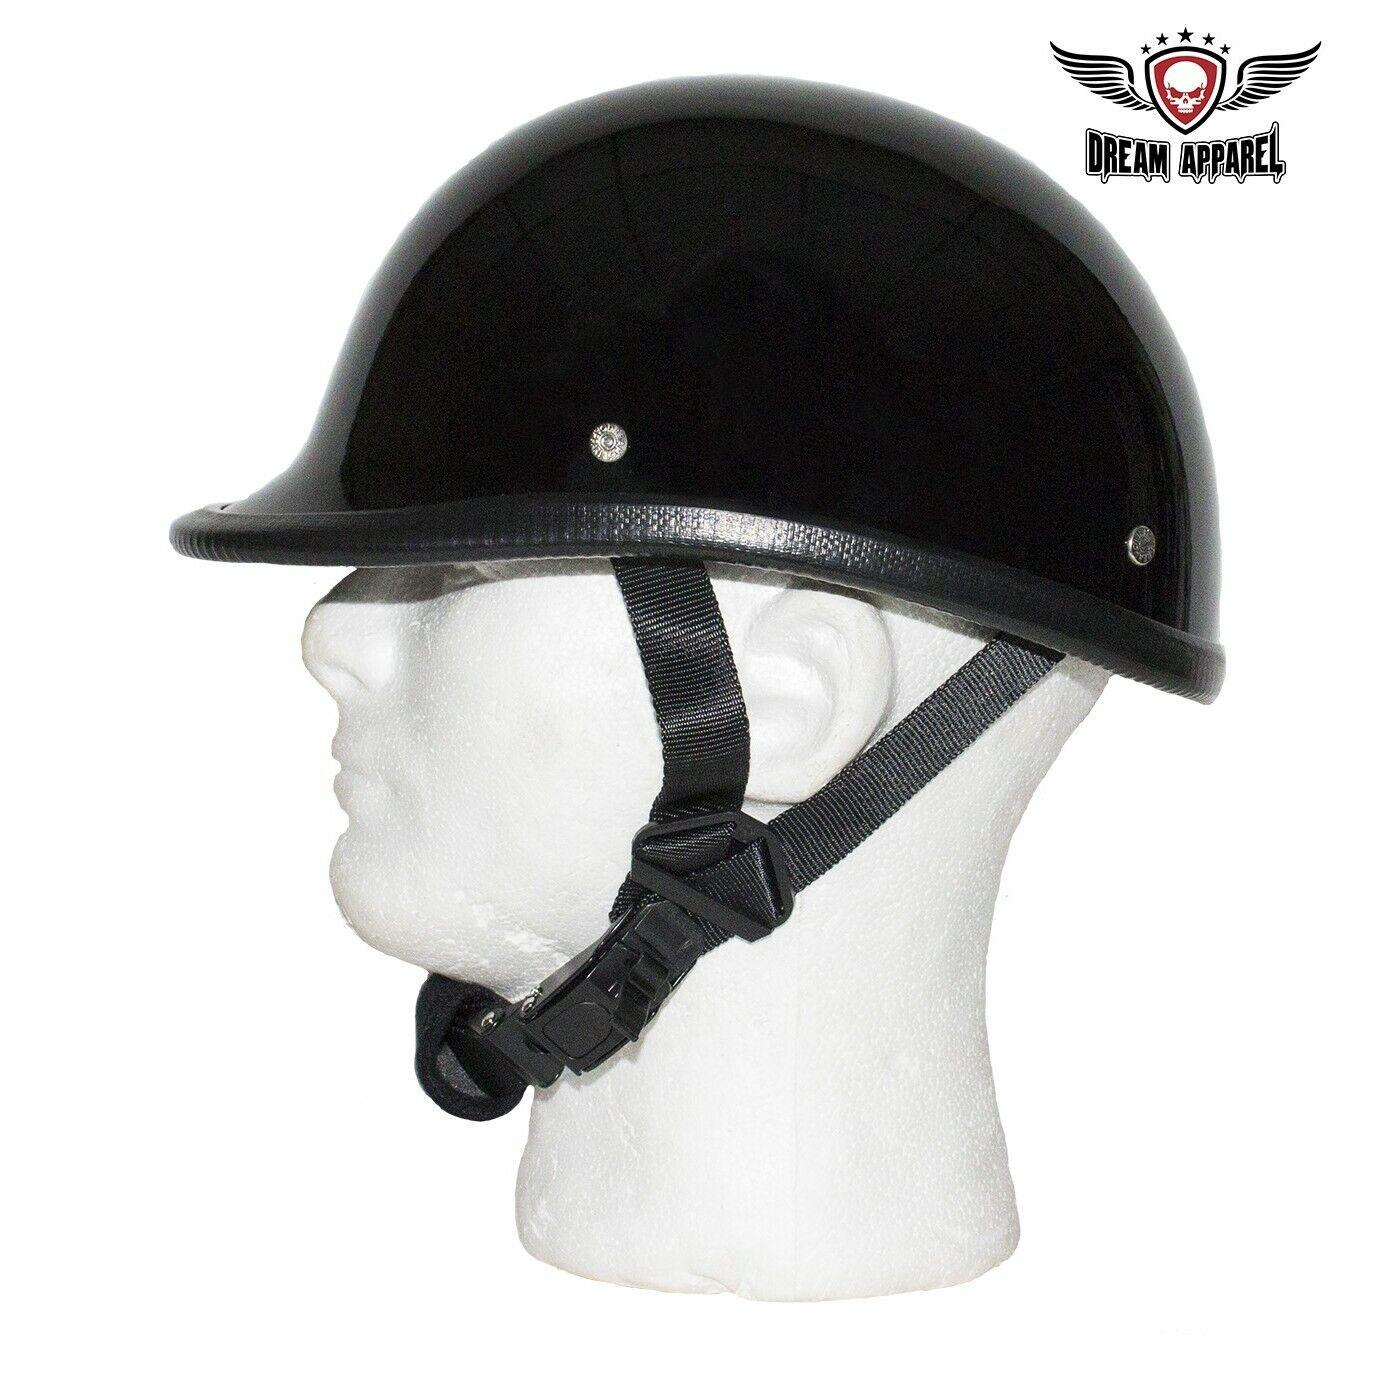 XL ~ Motorcycle Biker Novelty German Polo Helmet Touring Chopper Gloss black